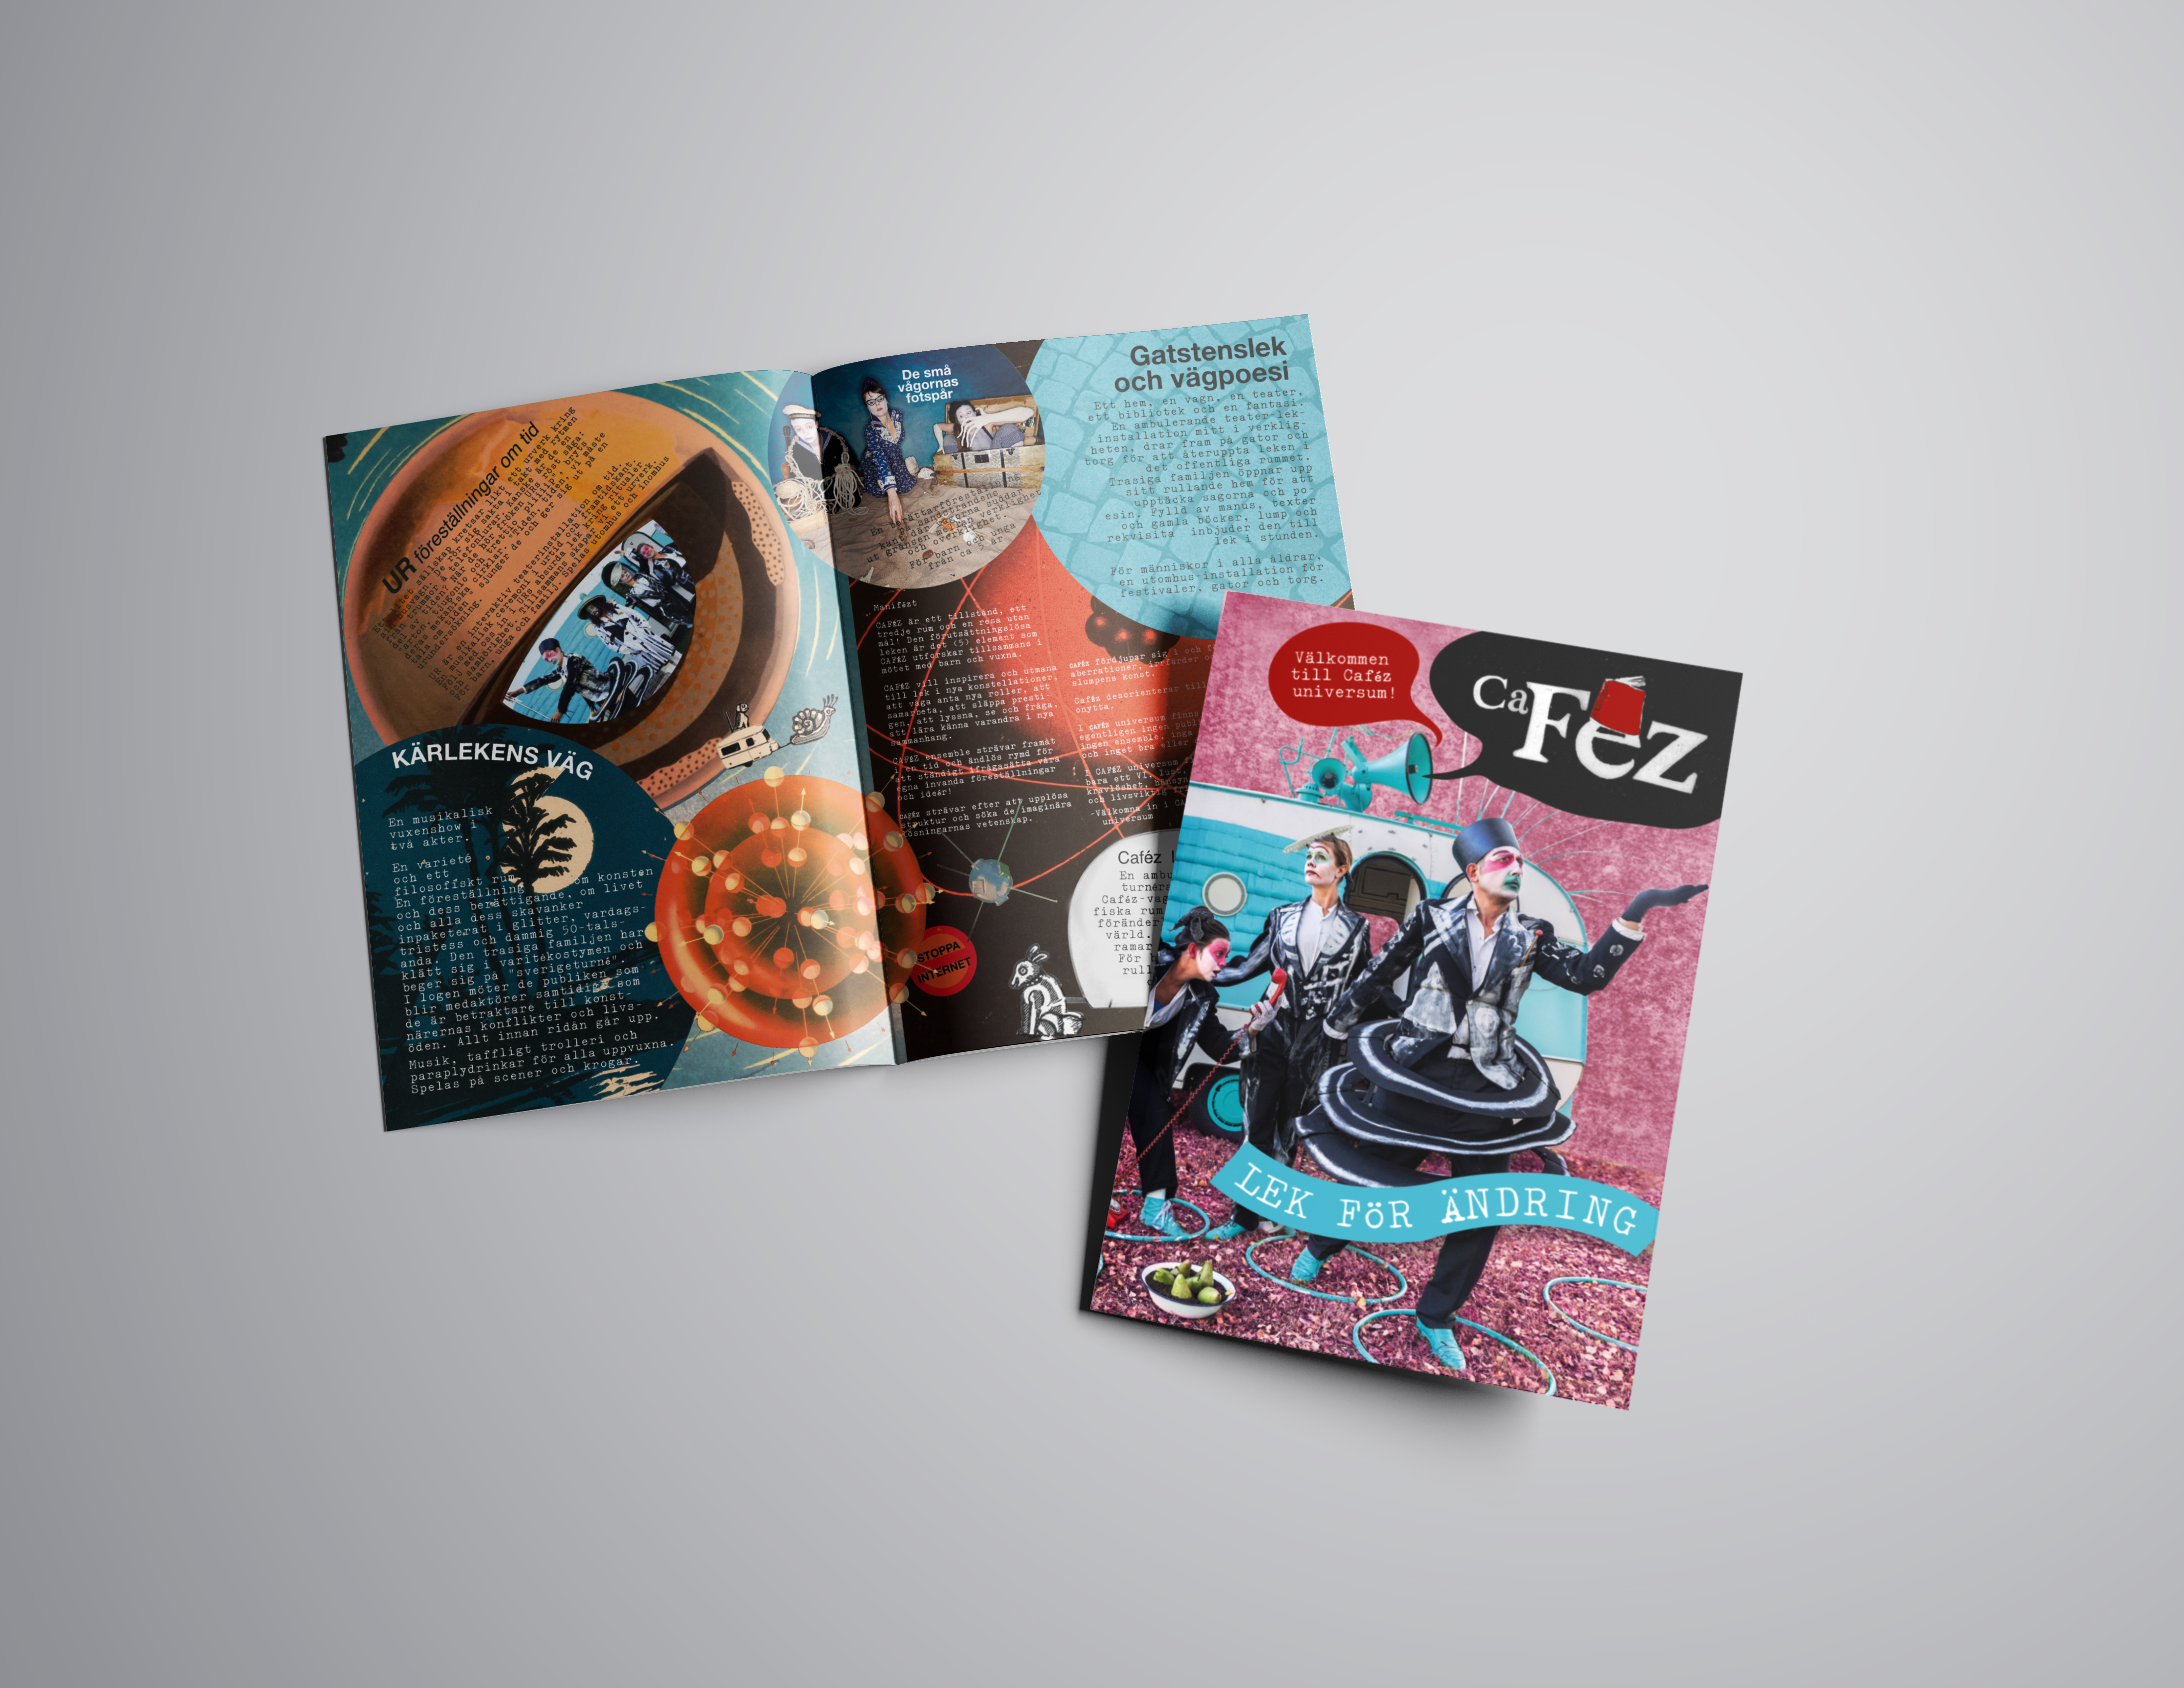 Cafez broschyr